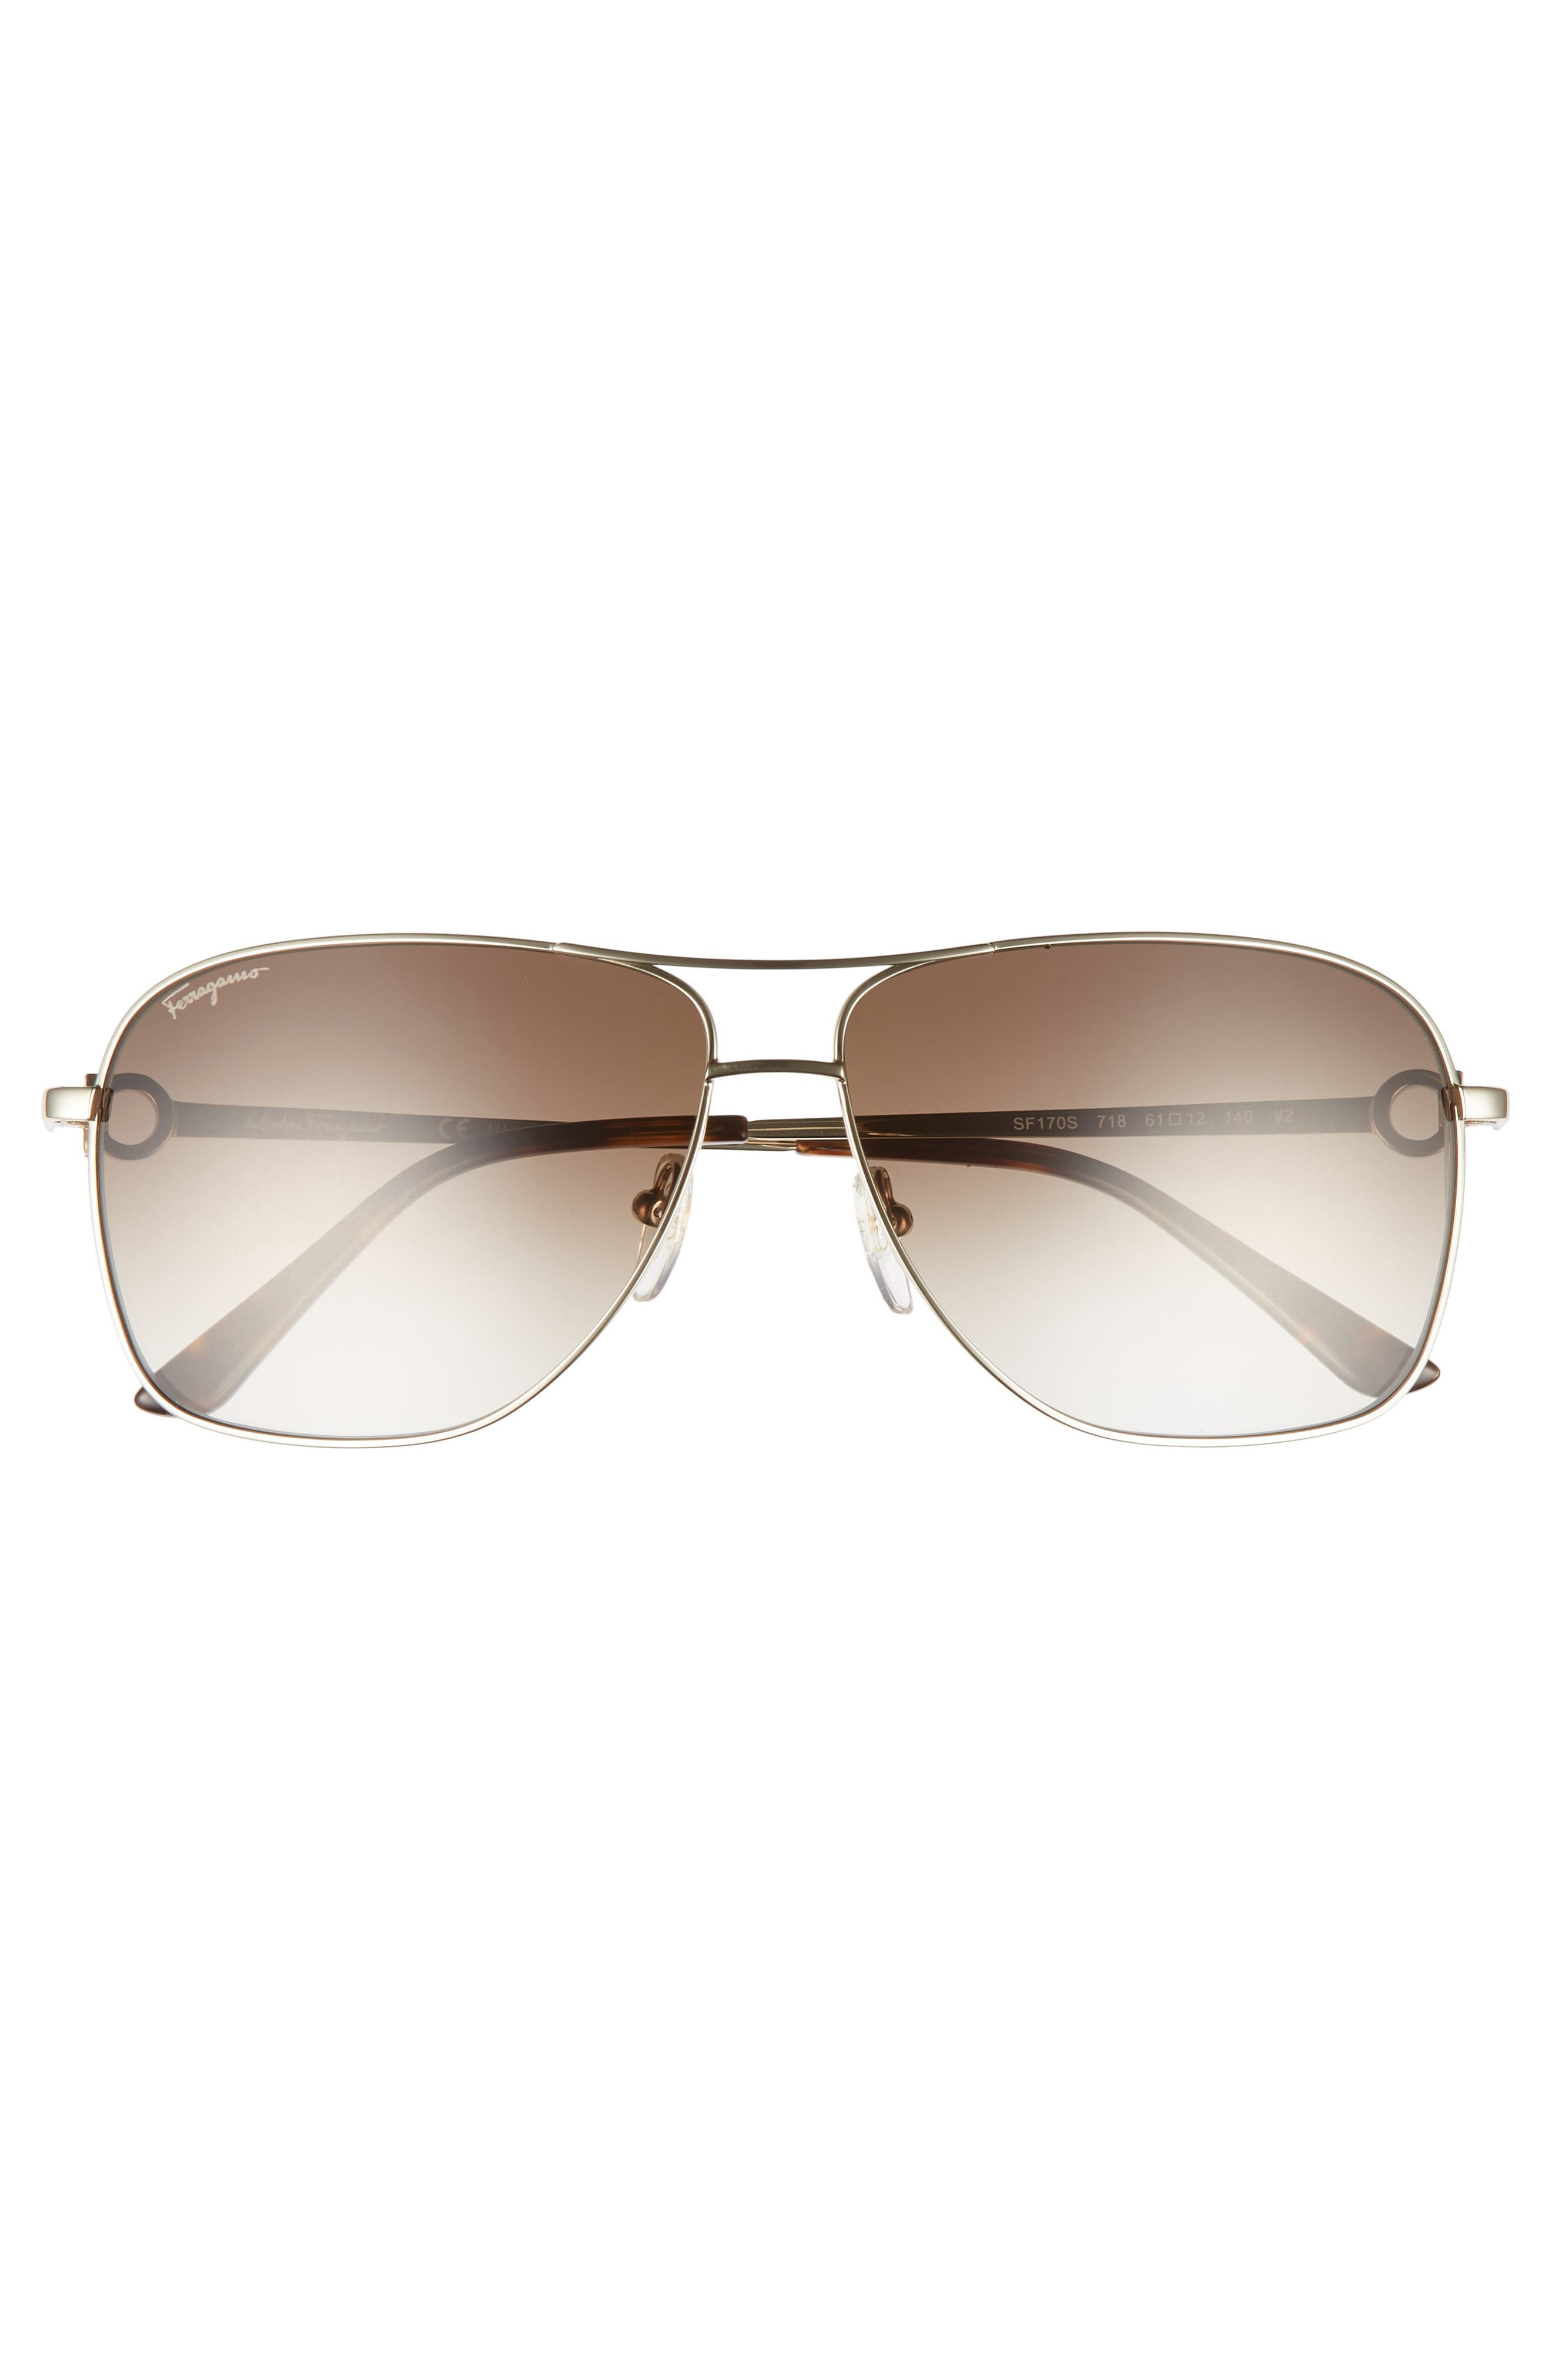 Gancio 61mm Aviator Sunglasses,                             Alternate thumbnail 2, color,                             SHINY GOLD